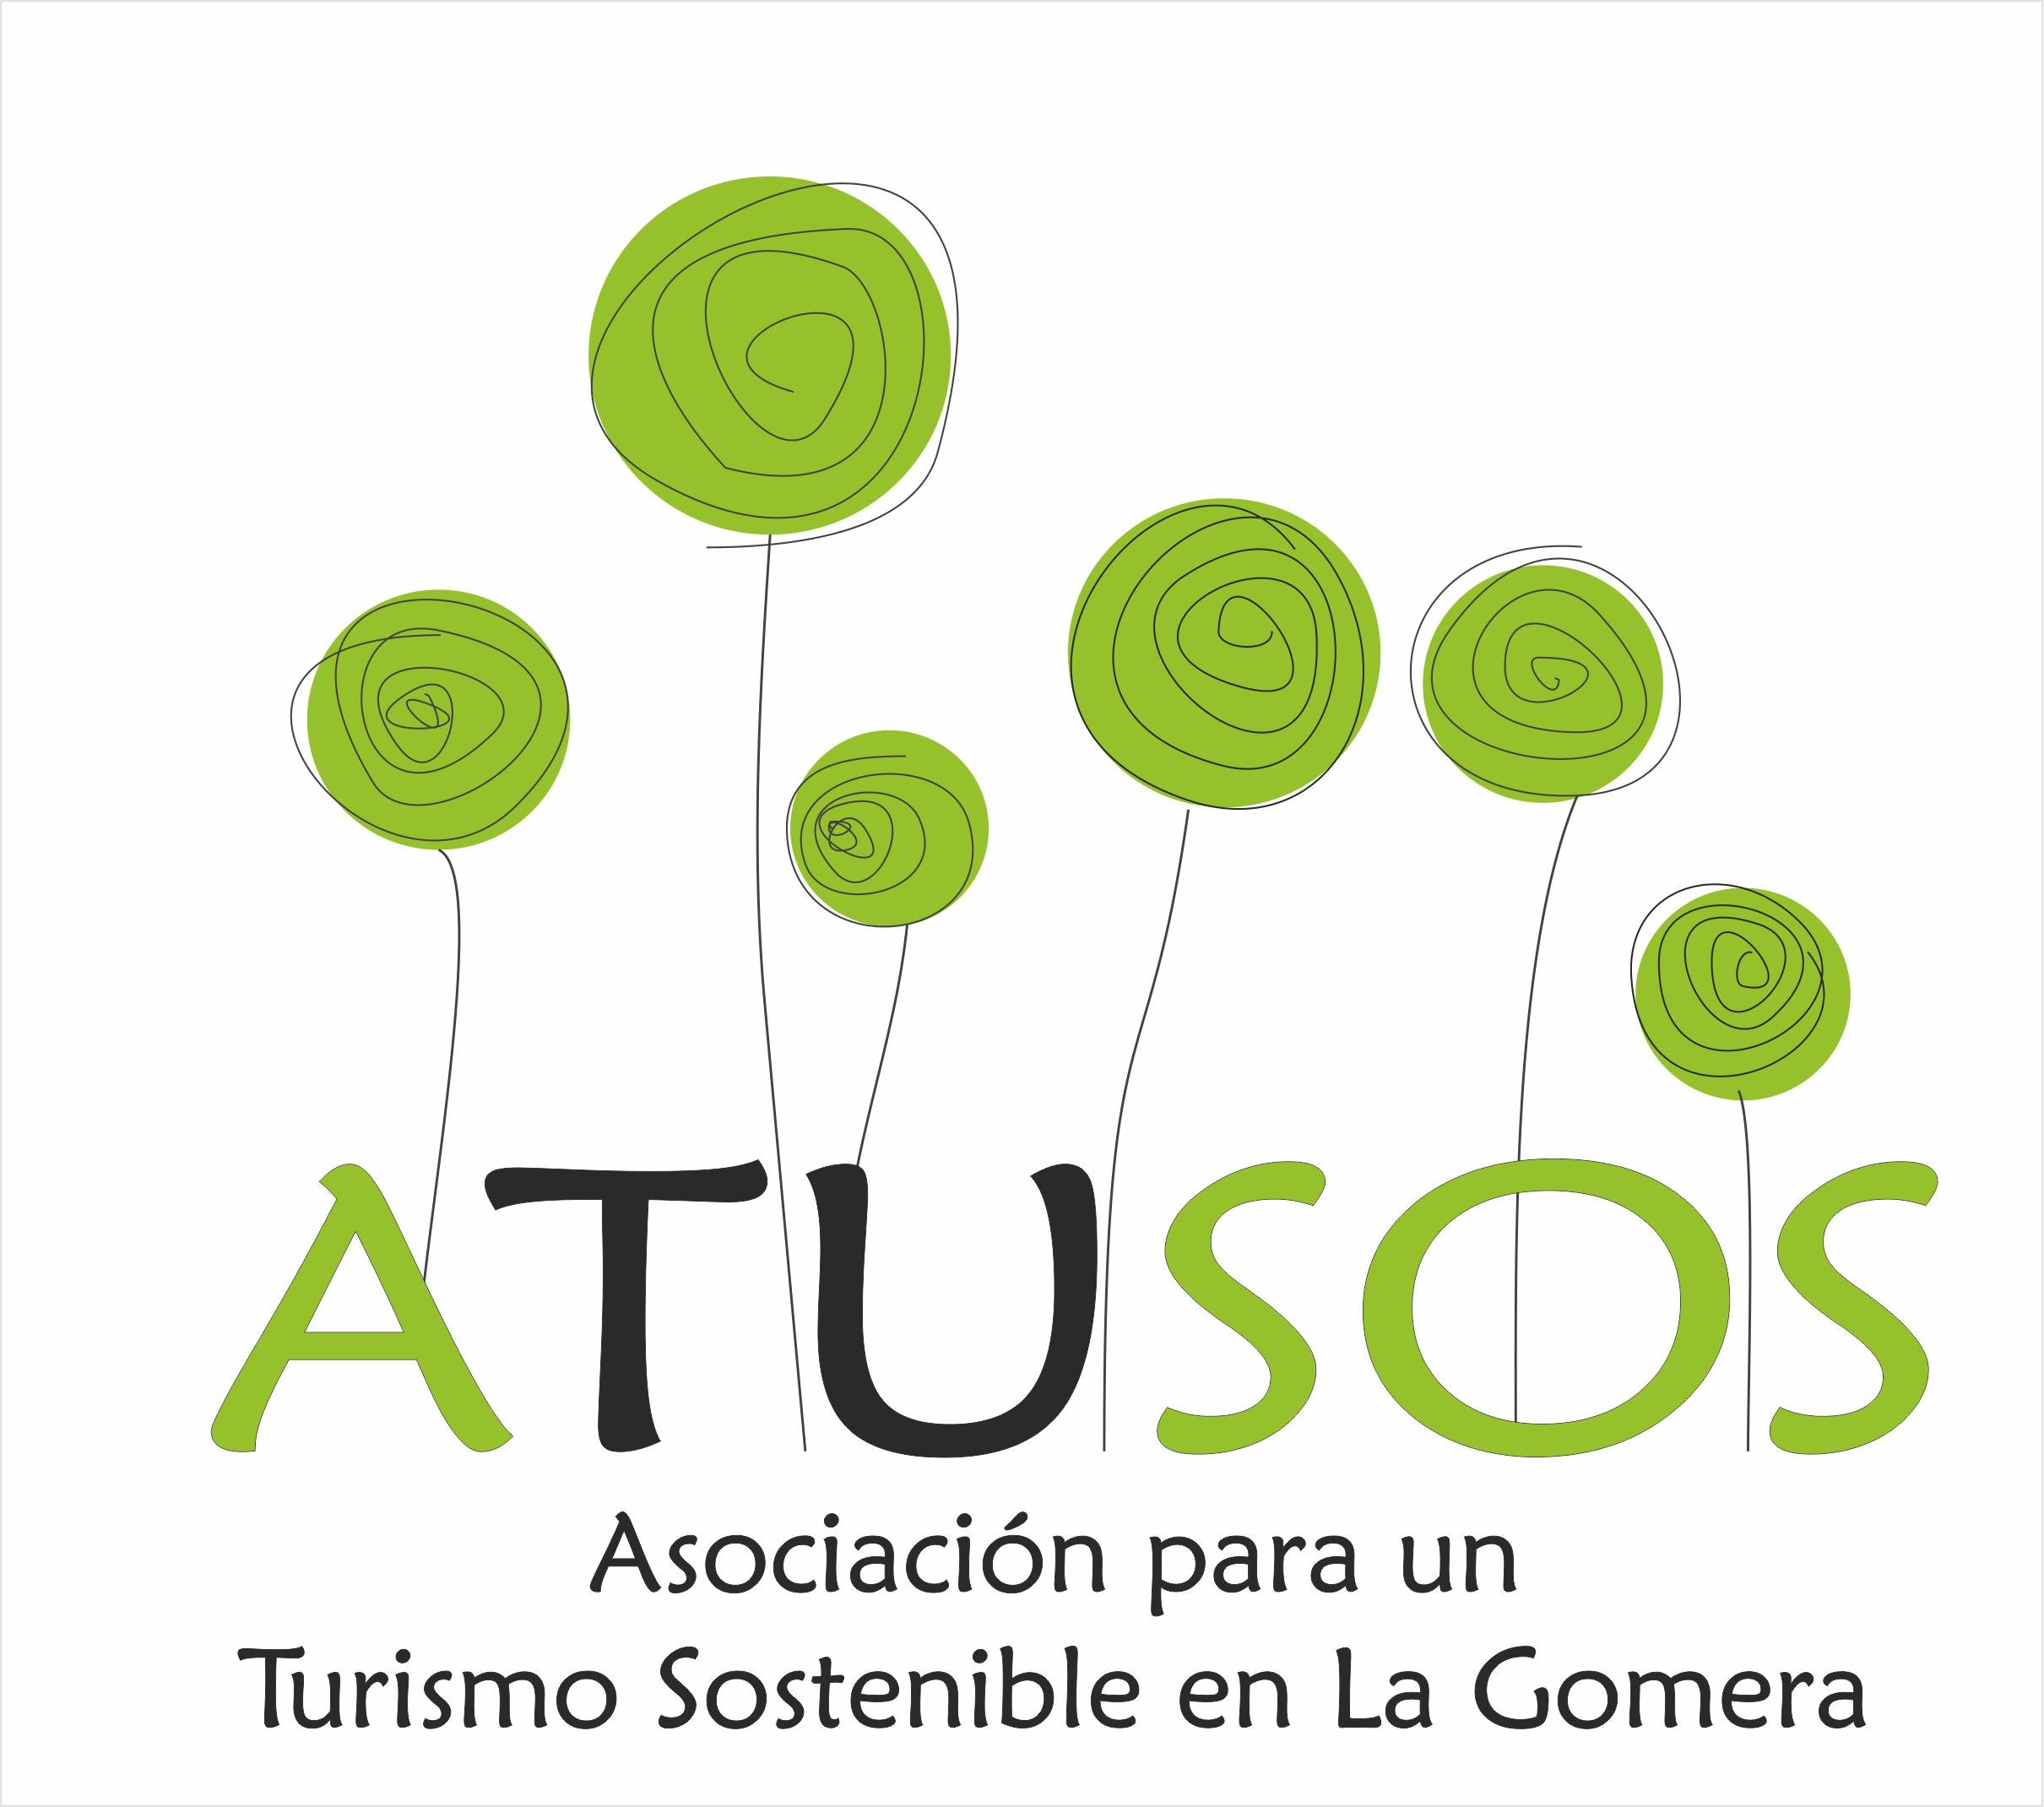 ATUSOS